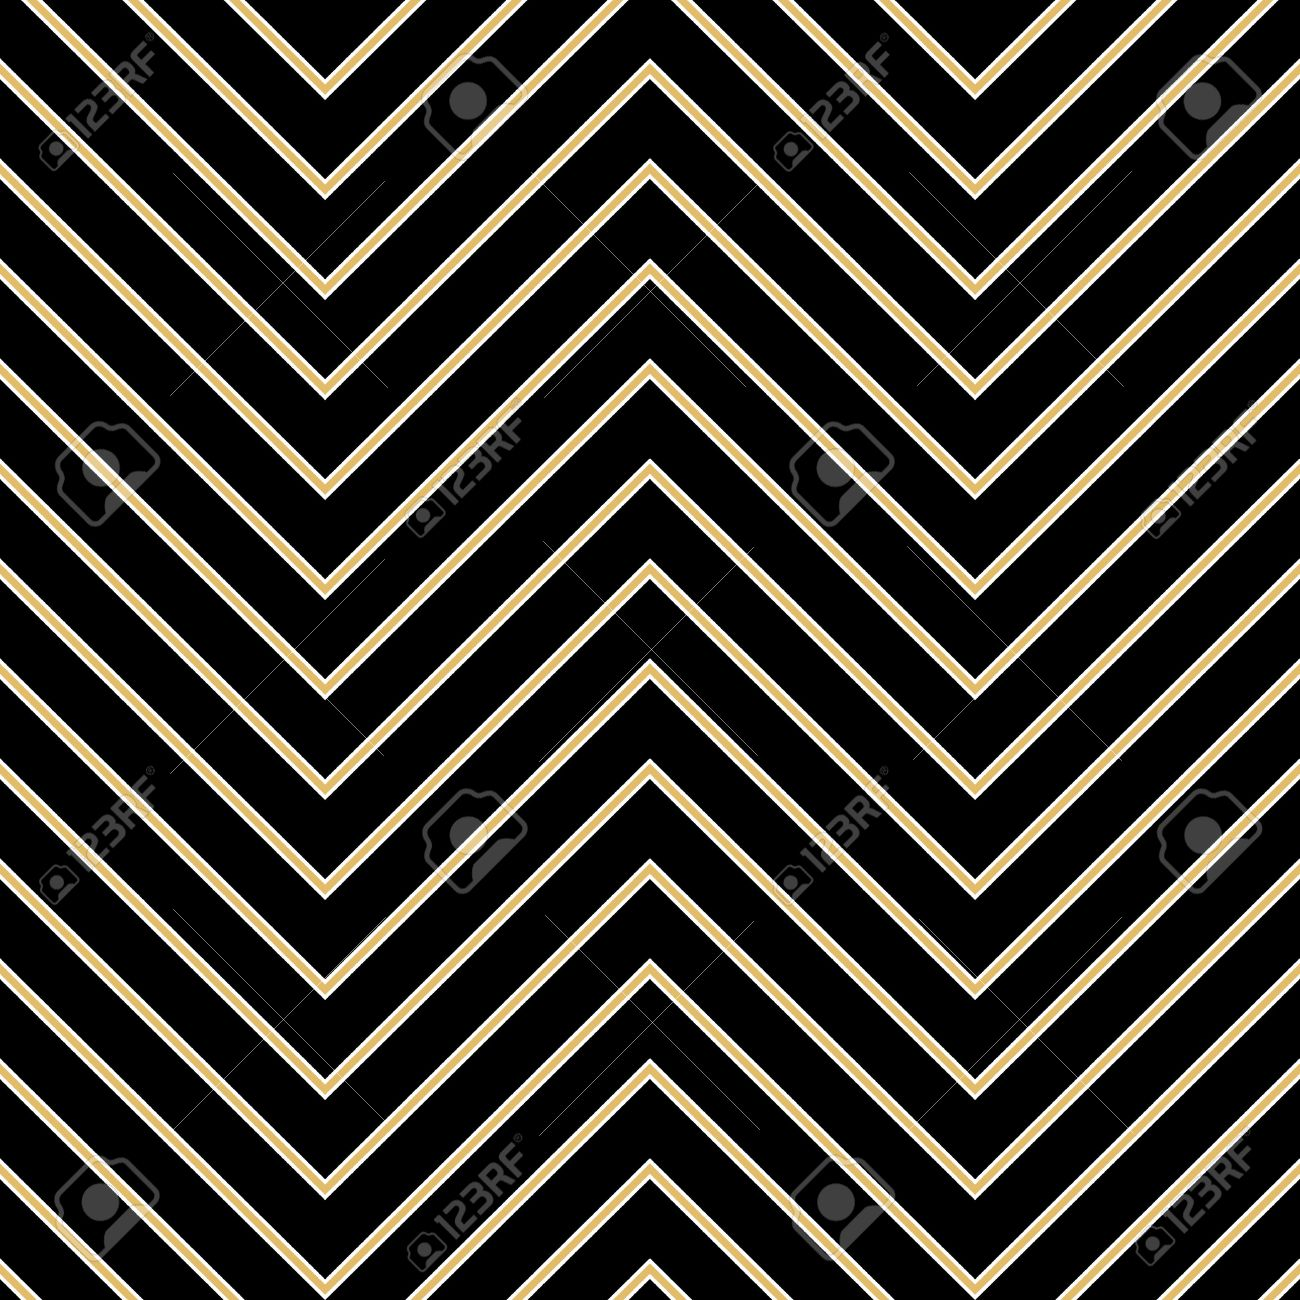 Art Deco Seamless Vintage Wallpaper Patterns Vector